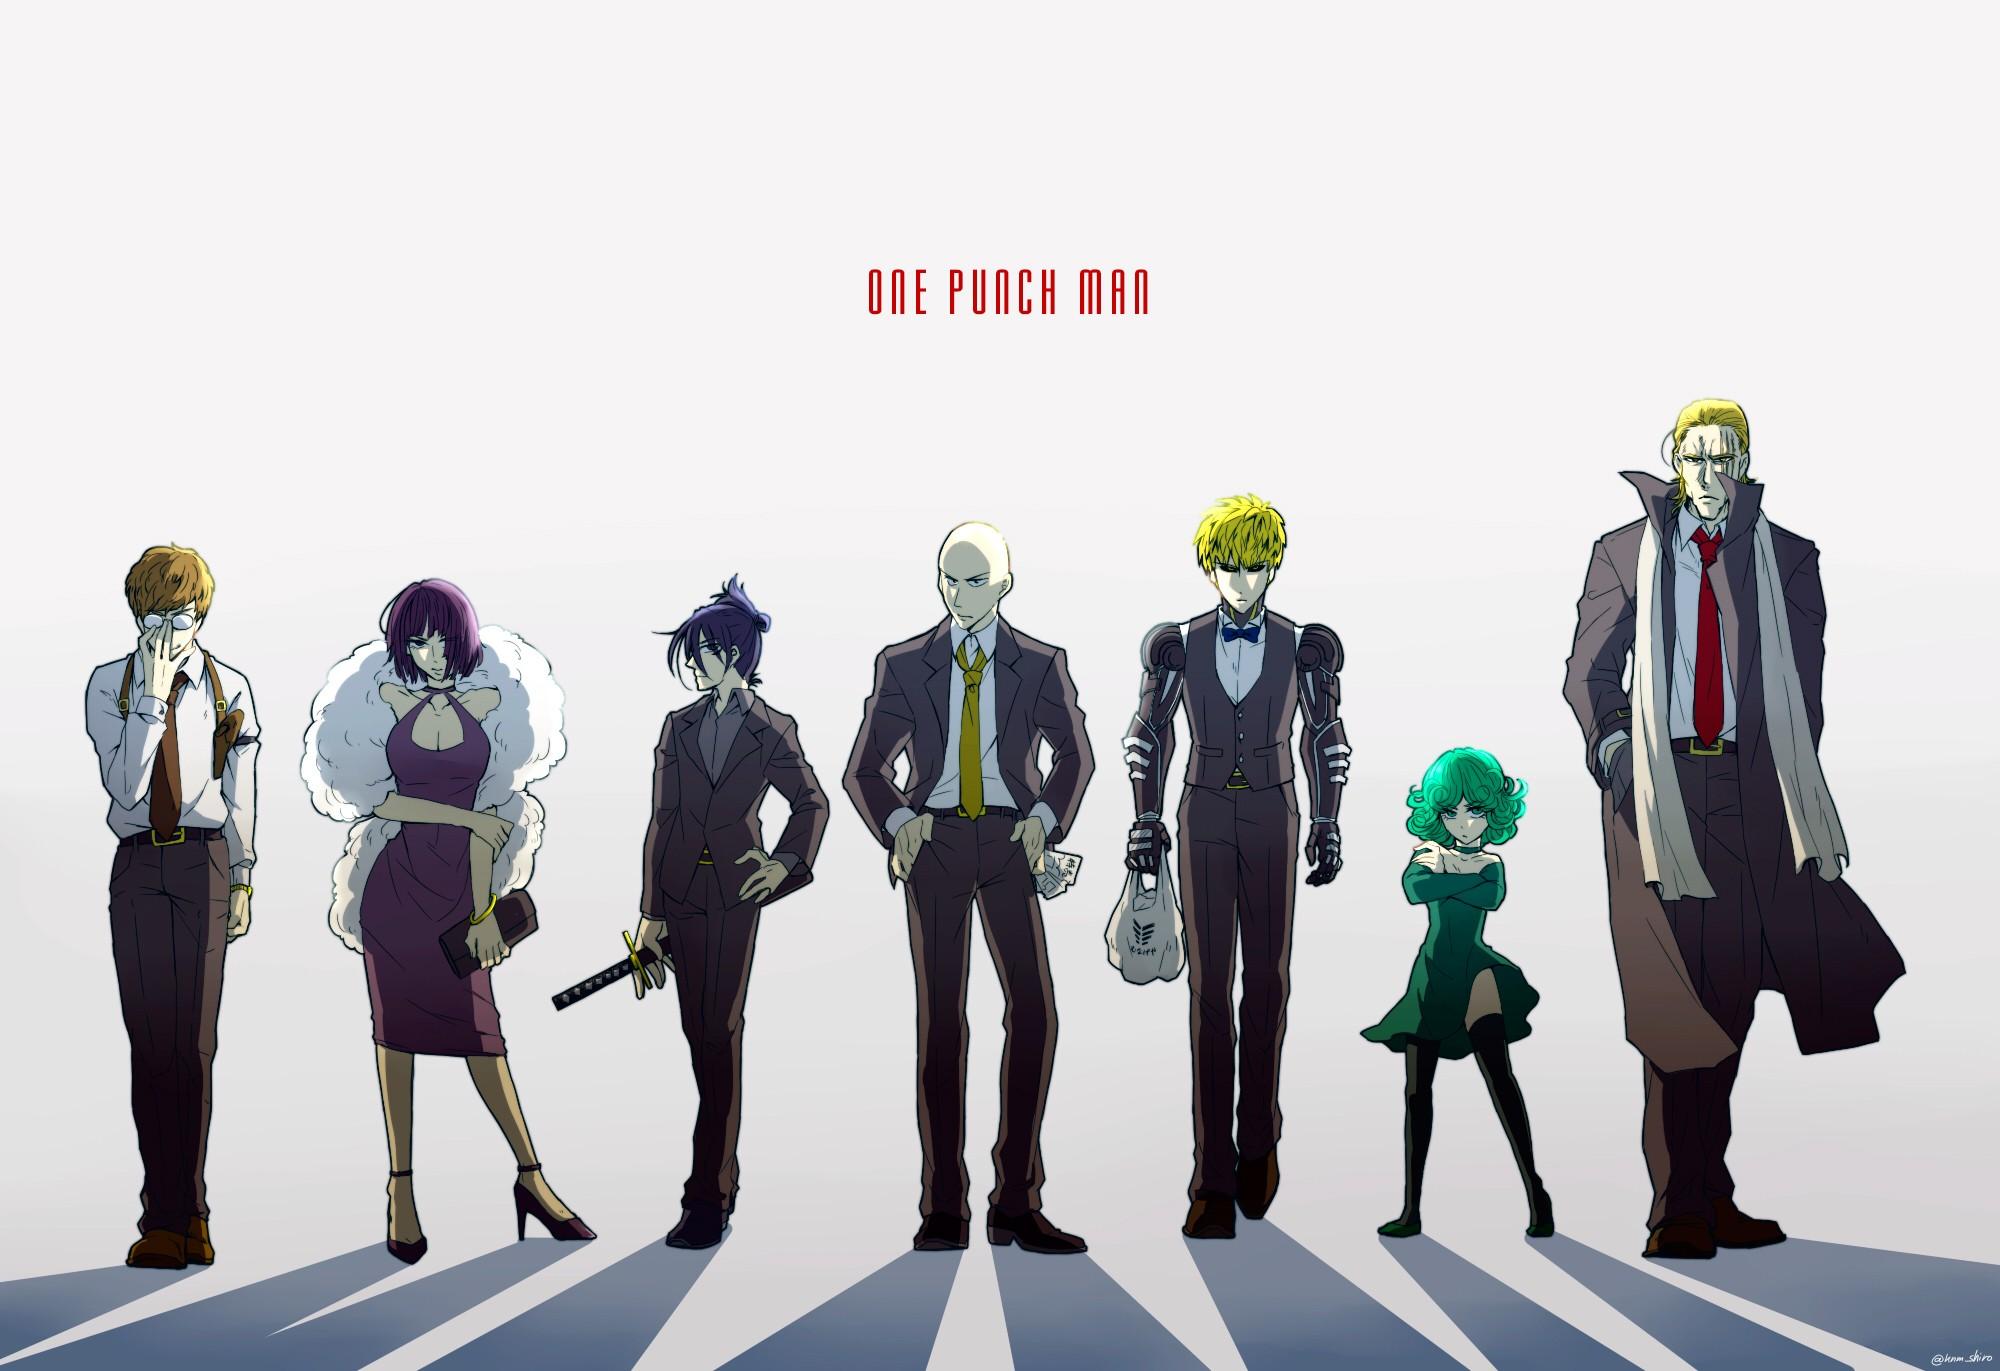 Anime 2000x1371 One-Punch Man Saitama Genos Fubuki Tatsumaki Mumen Rider Sonic (One Punch Man) anime